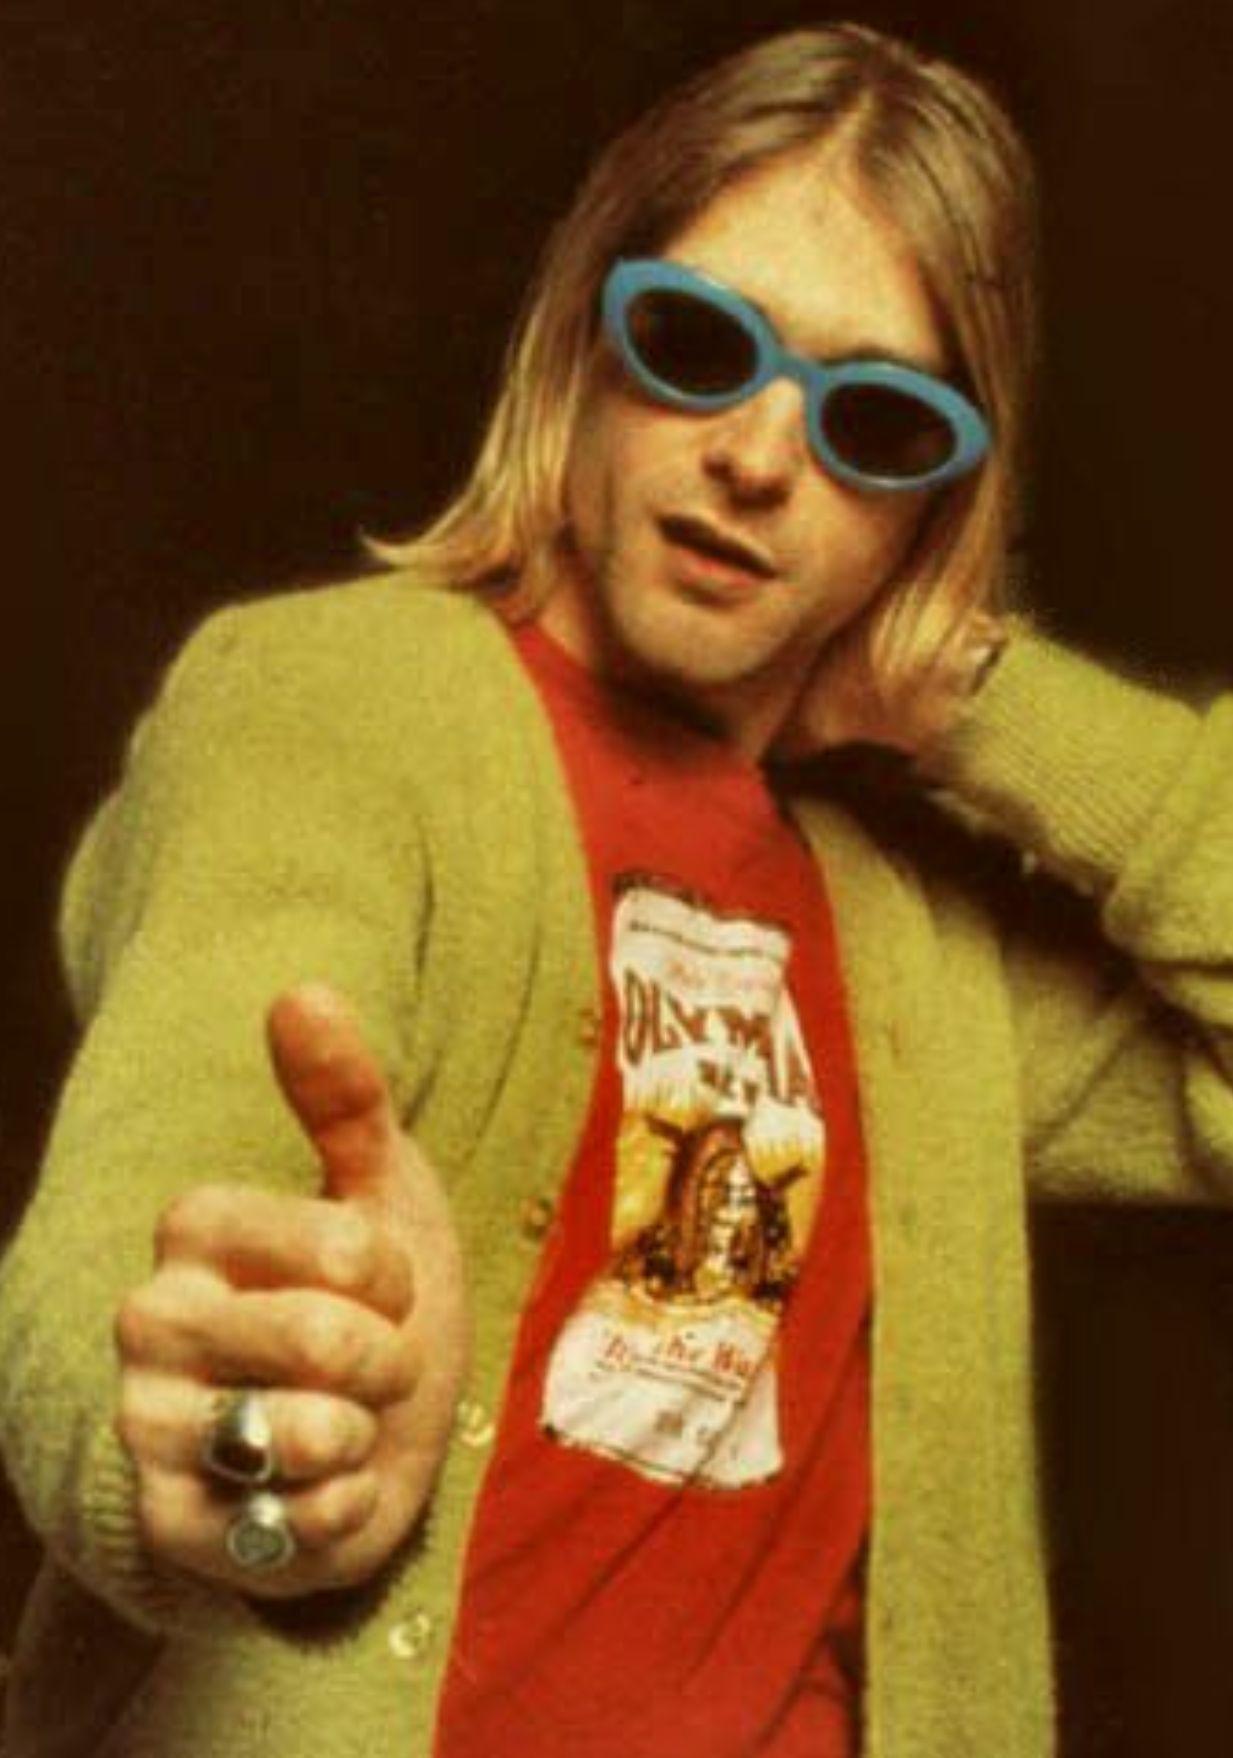 kurt cobain cardigan charisma Blank Template - Imgflip